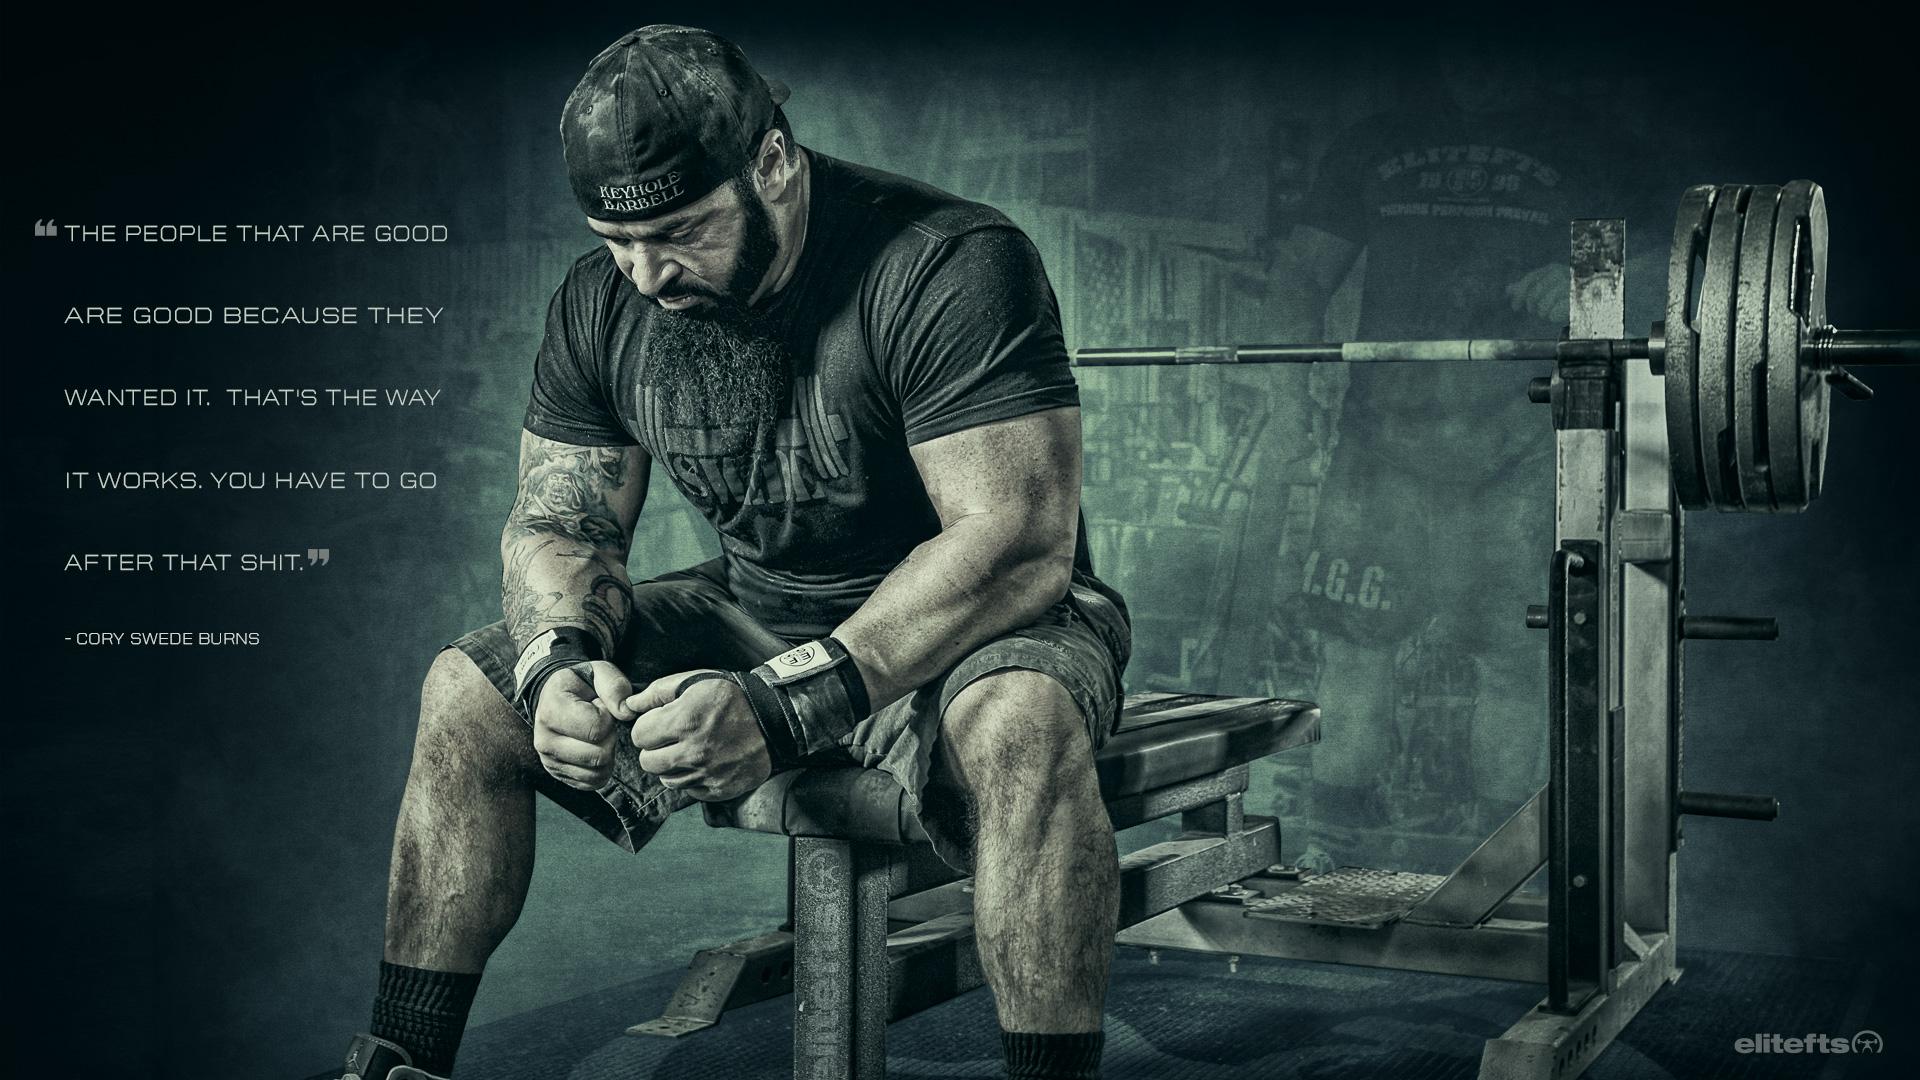 Best 54 Strongman Wallpaper on HipWallpaper Strongman Wallpaper 1920x1080